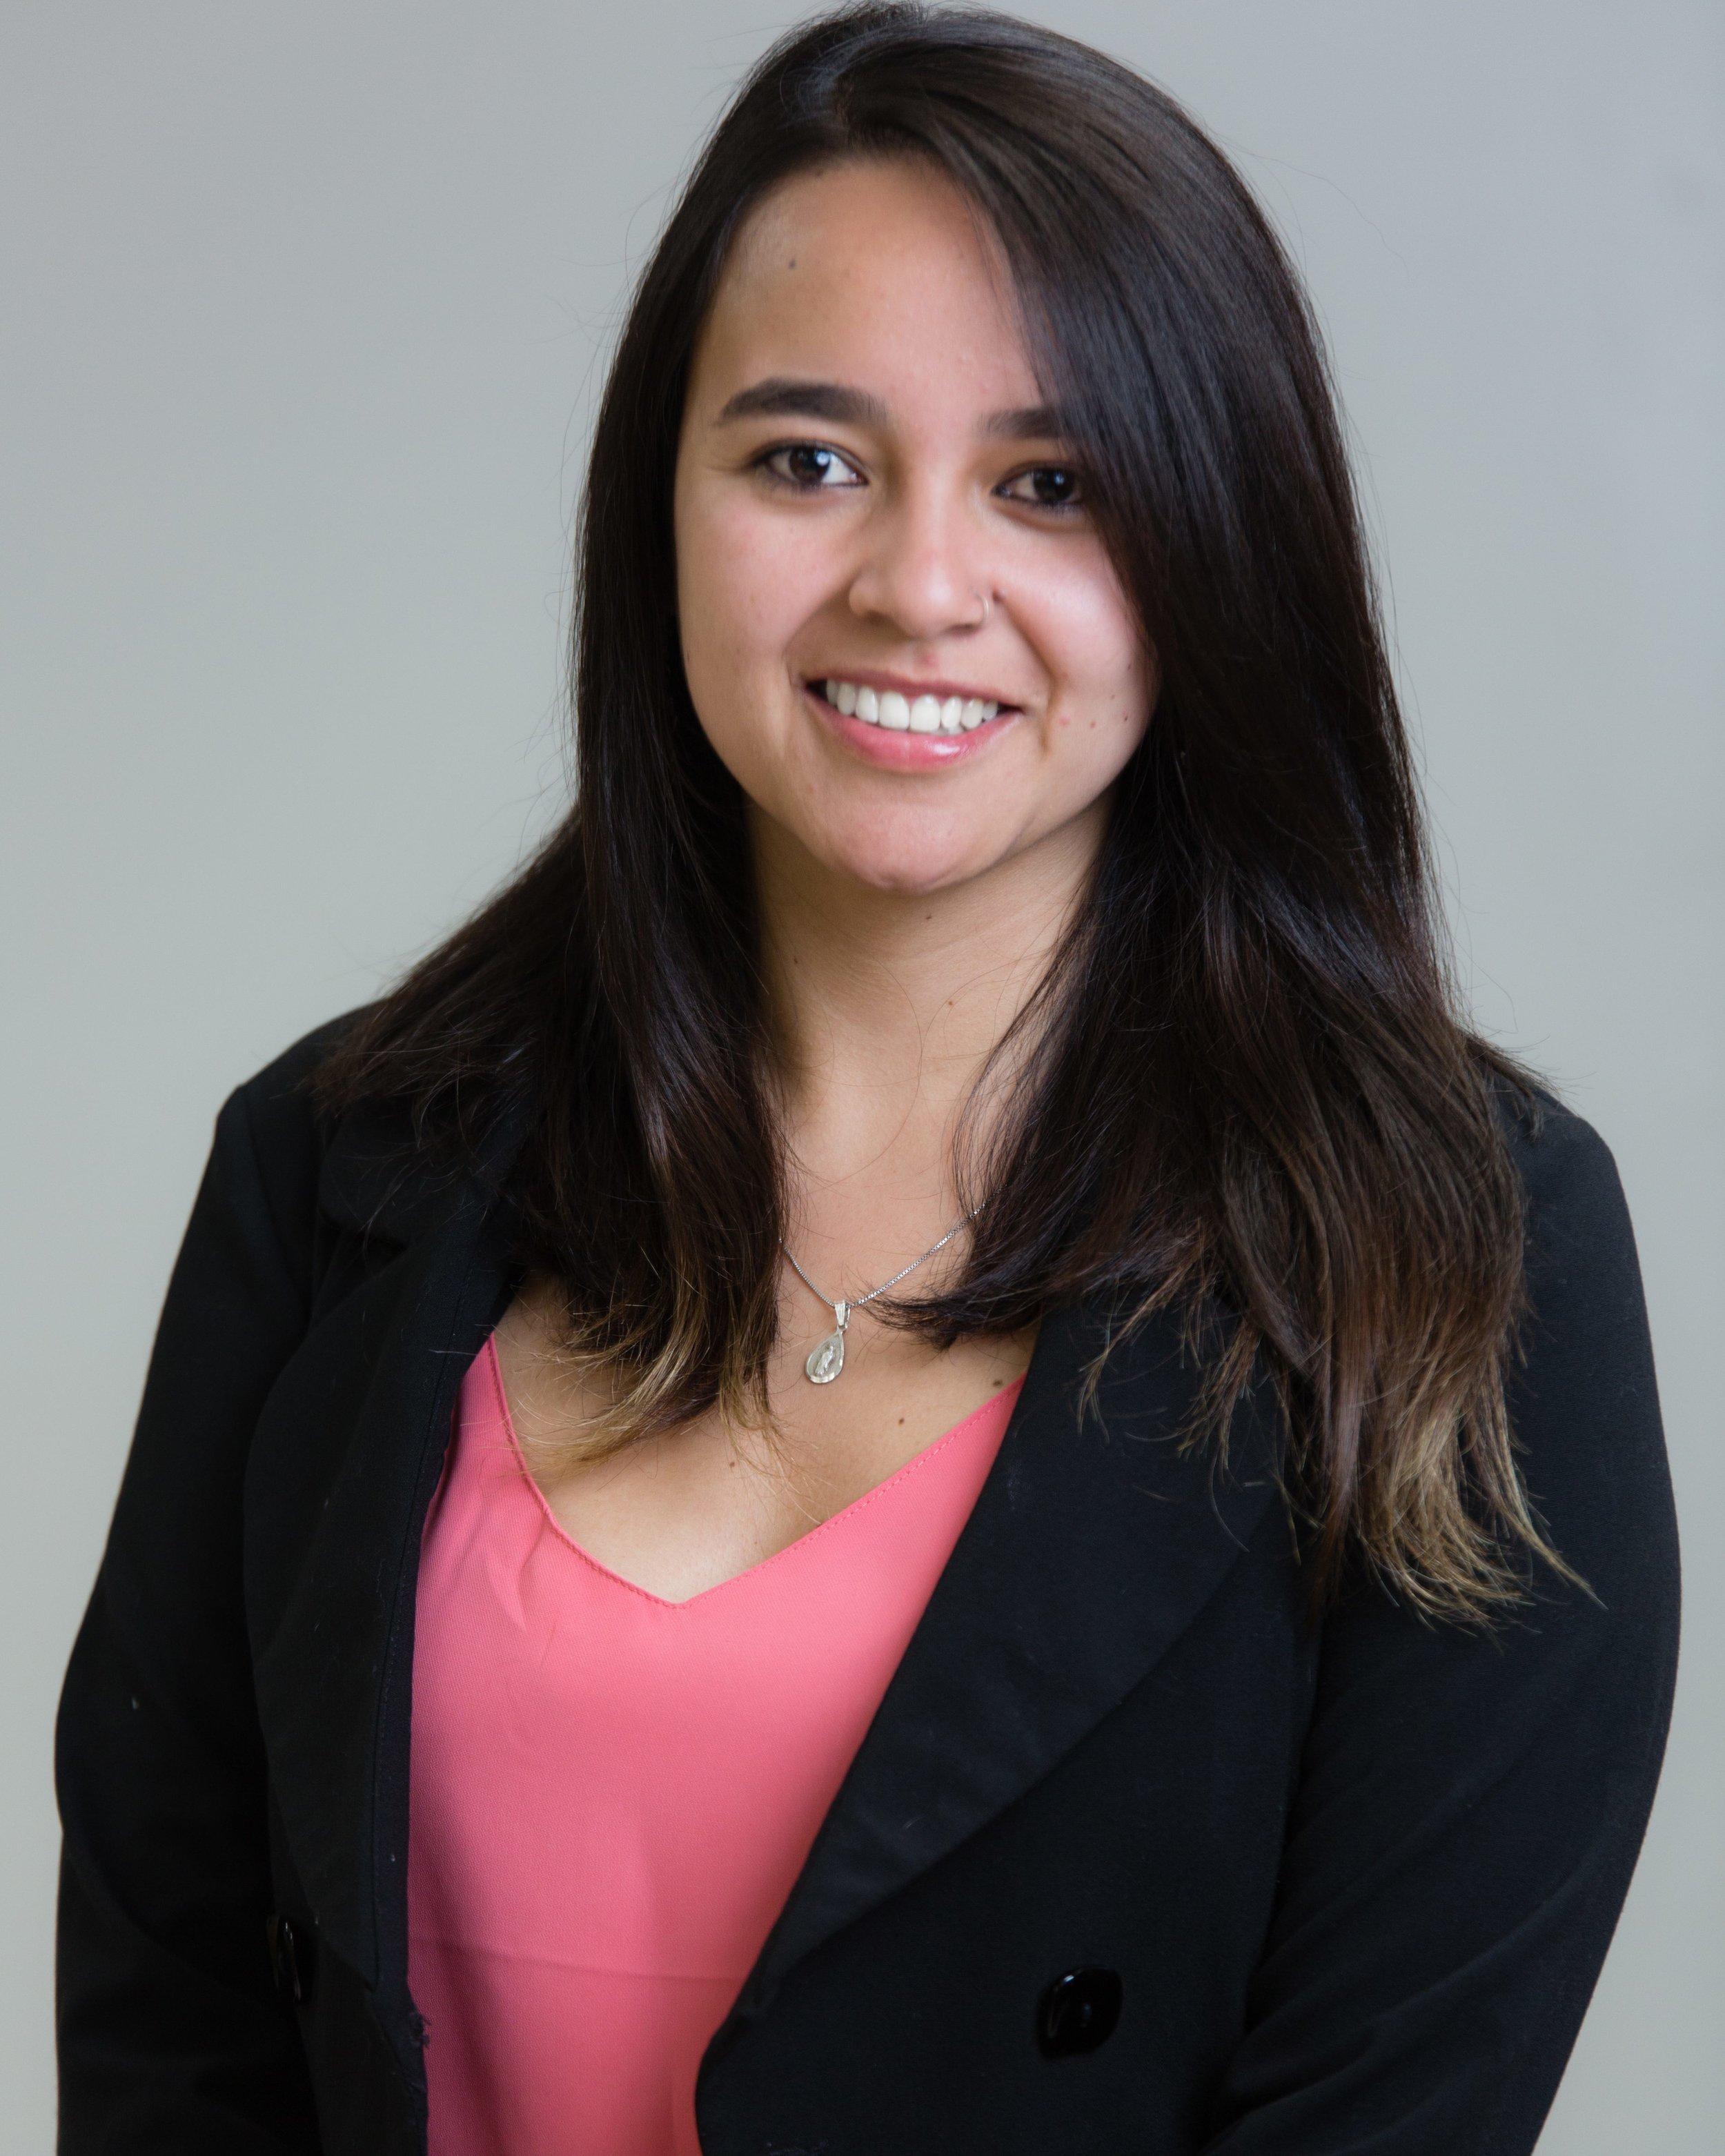 Angelica Barreto-Galvez - Graduate Student